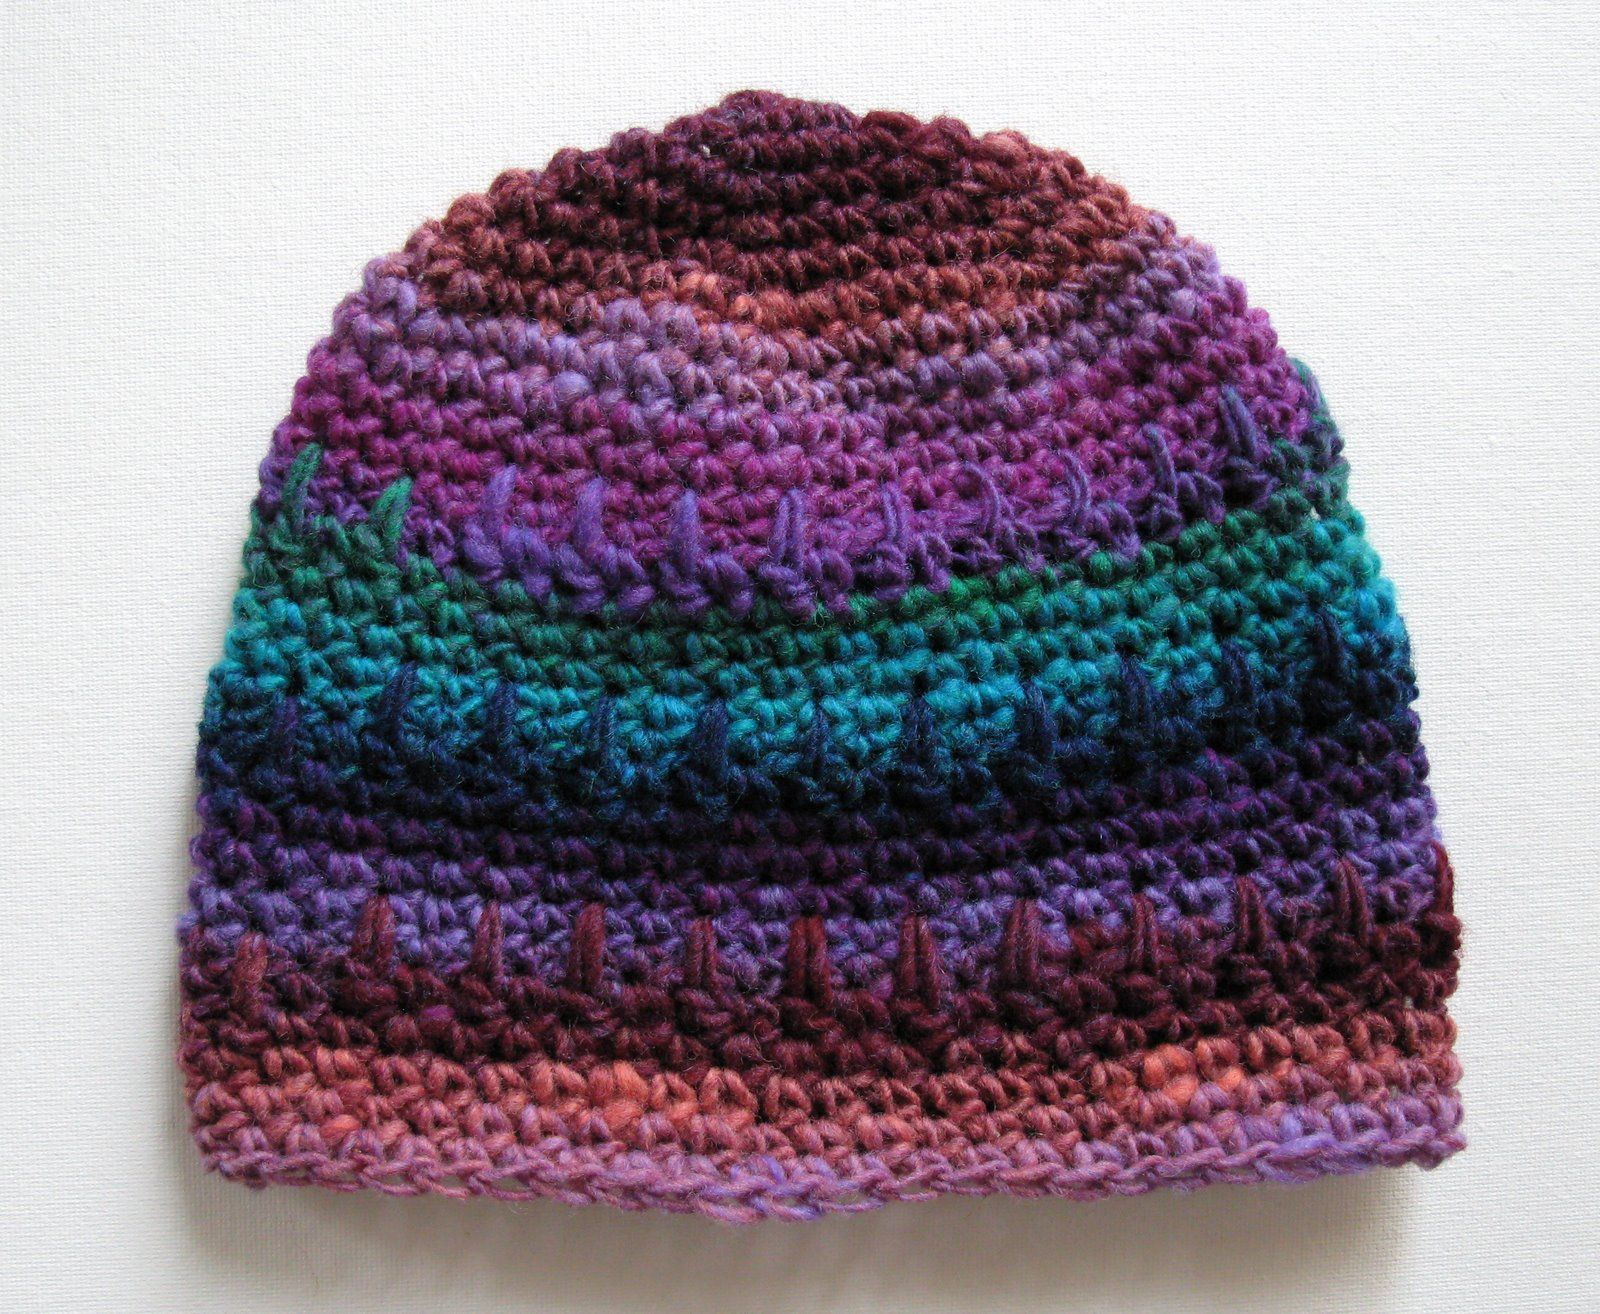 Yarn over Manhattan Free Patterns | a love for crochet | Pinterest ...